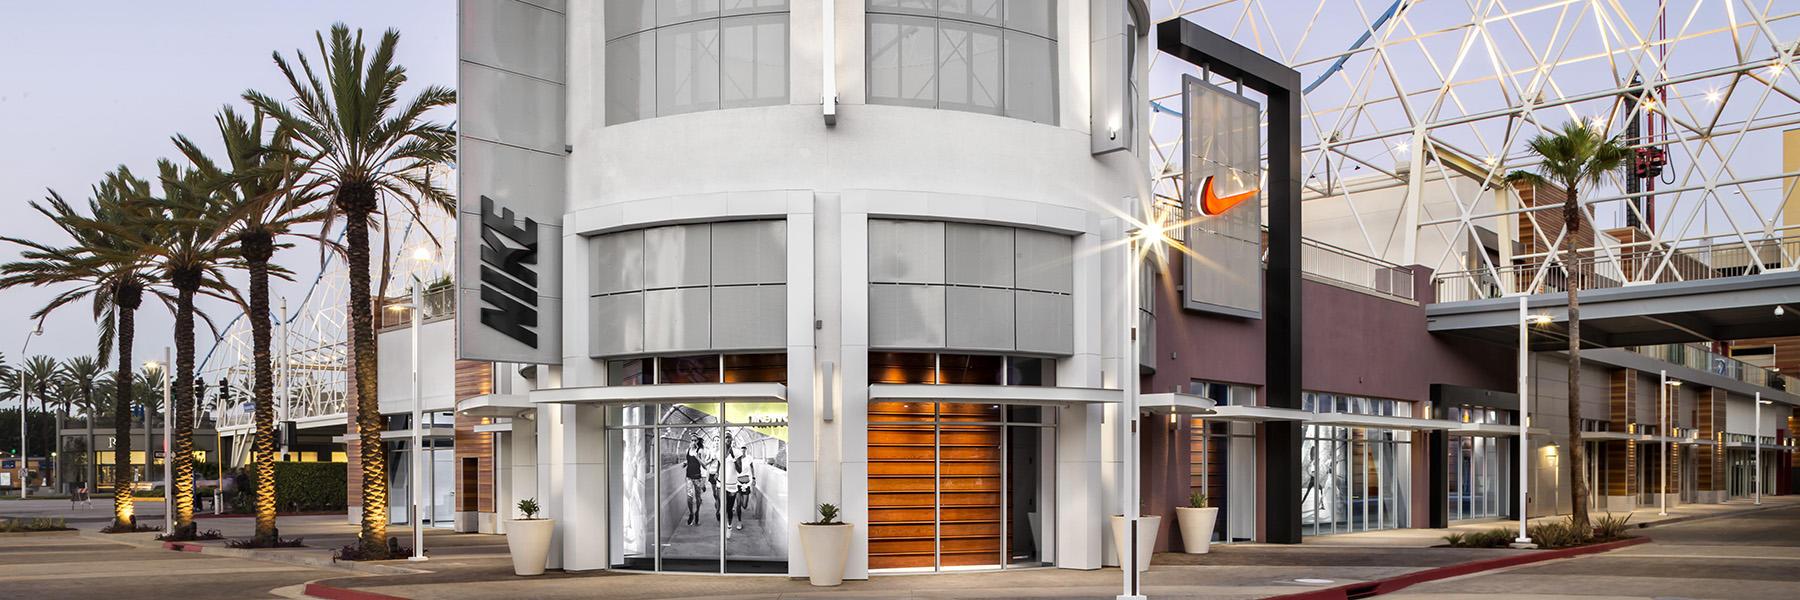 cfb40c704ef3 Nike Factory Store - Long Beach. Long Beach